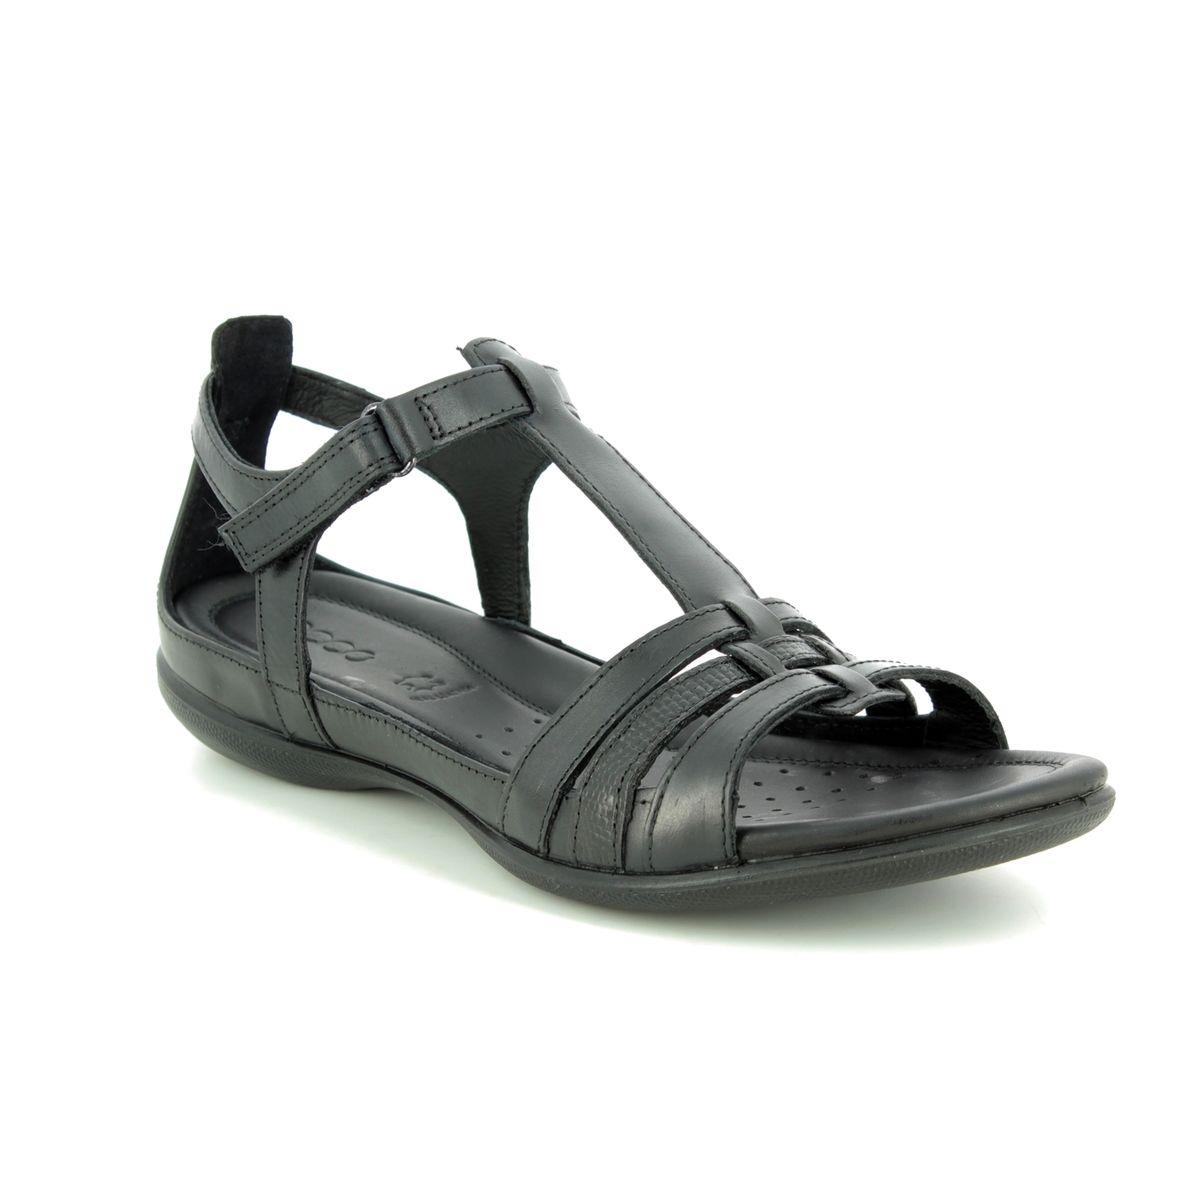 91e90a050ab5 ECCO Sandals - Black - 240873-53859 FLASH